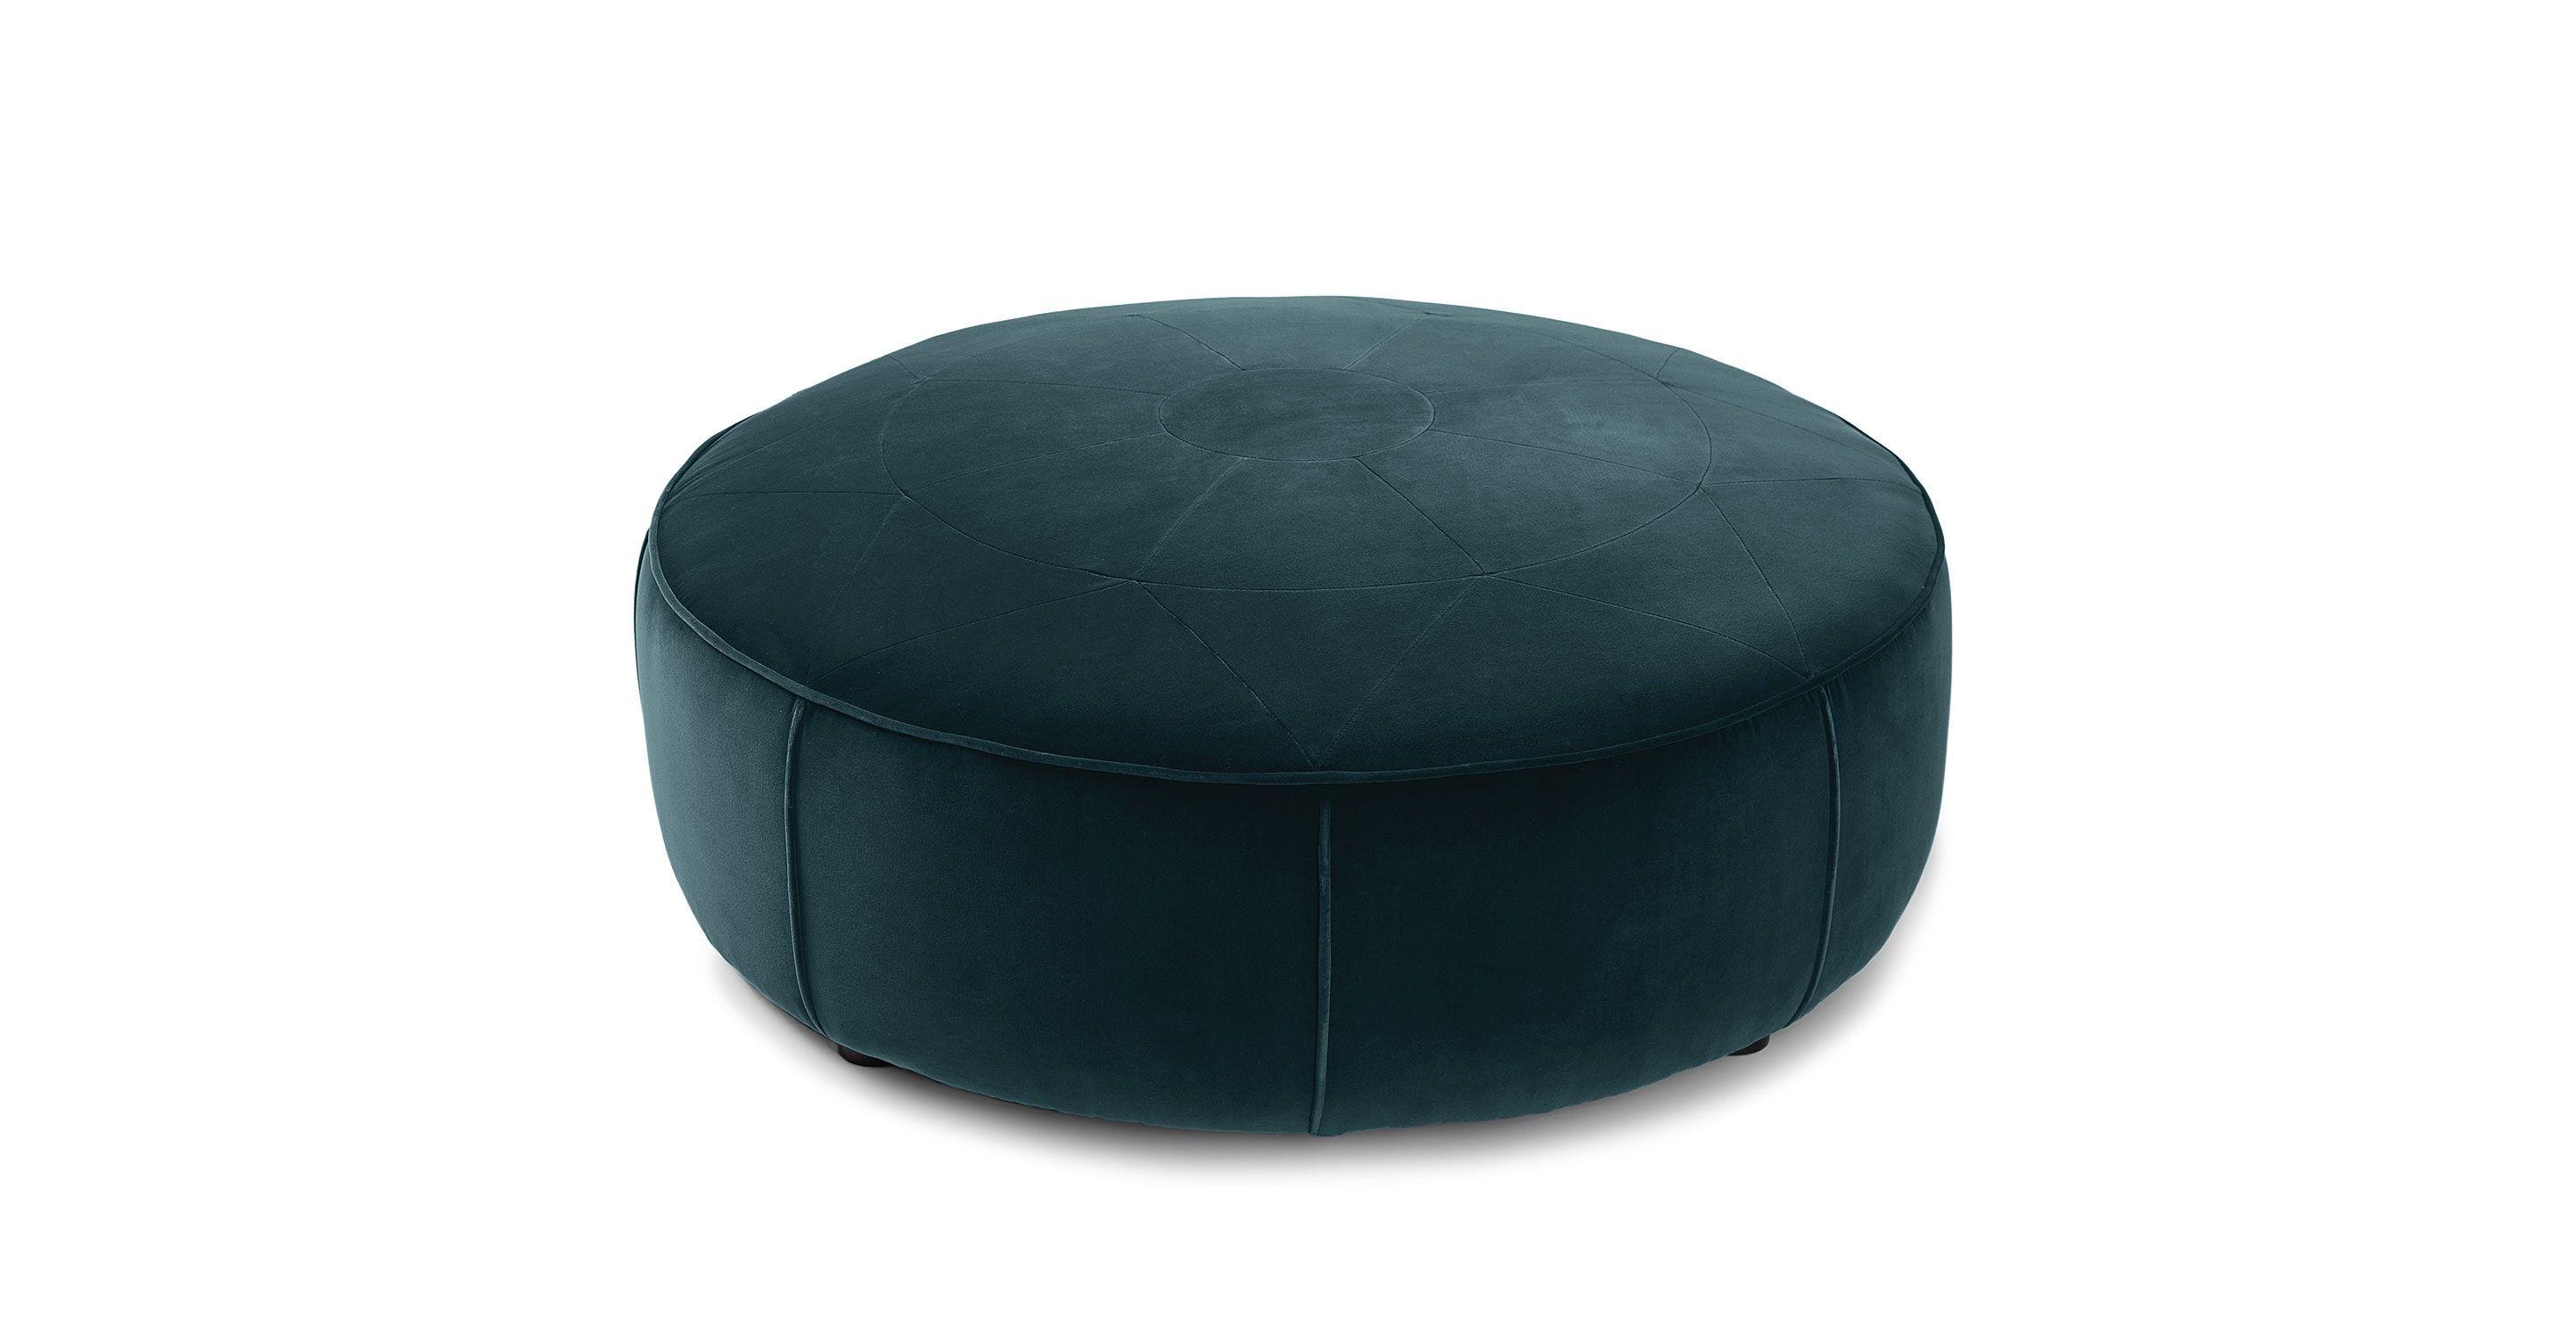 Blue Velvet Tufted Ottoman - Round | Article Orbis Modern Furniture